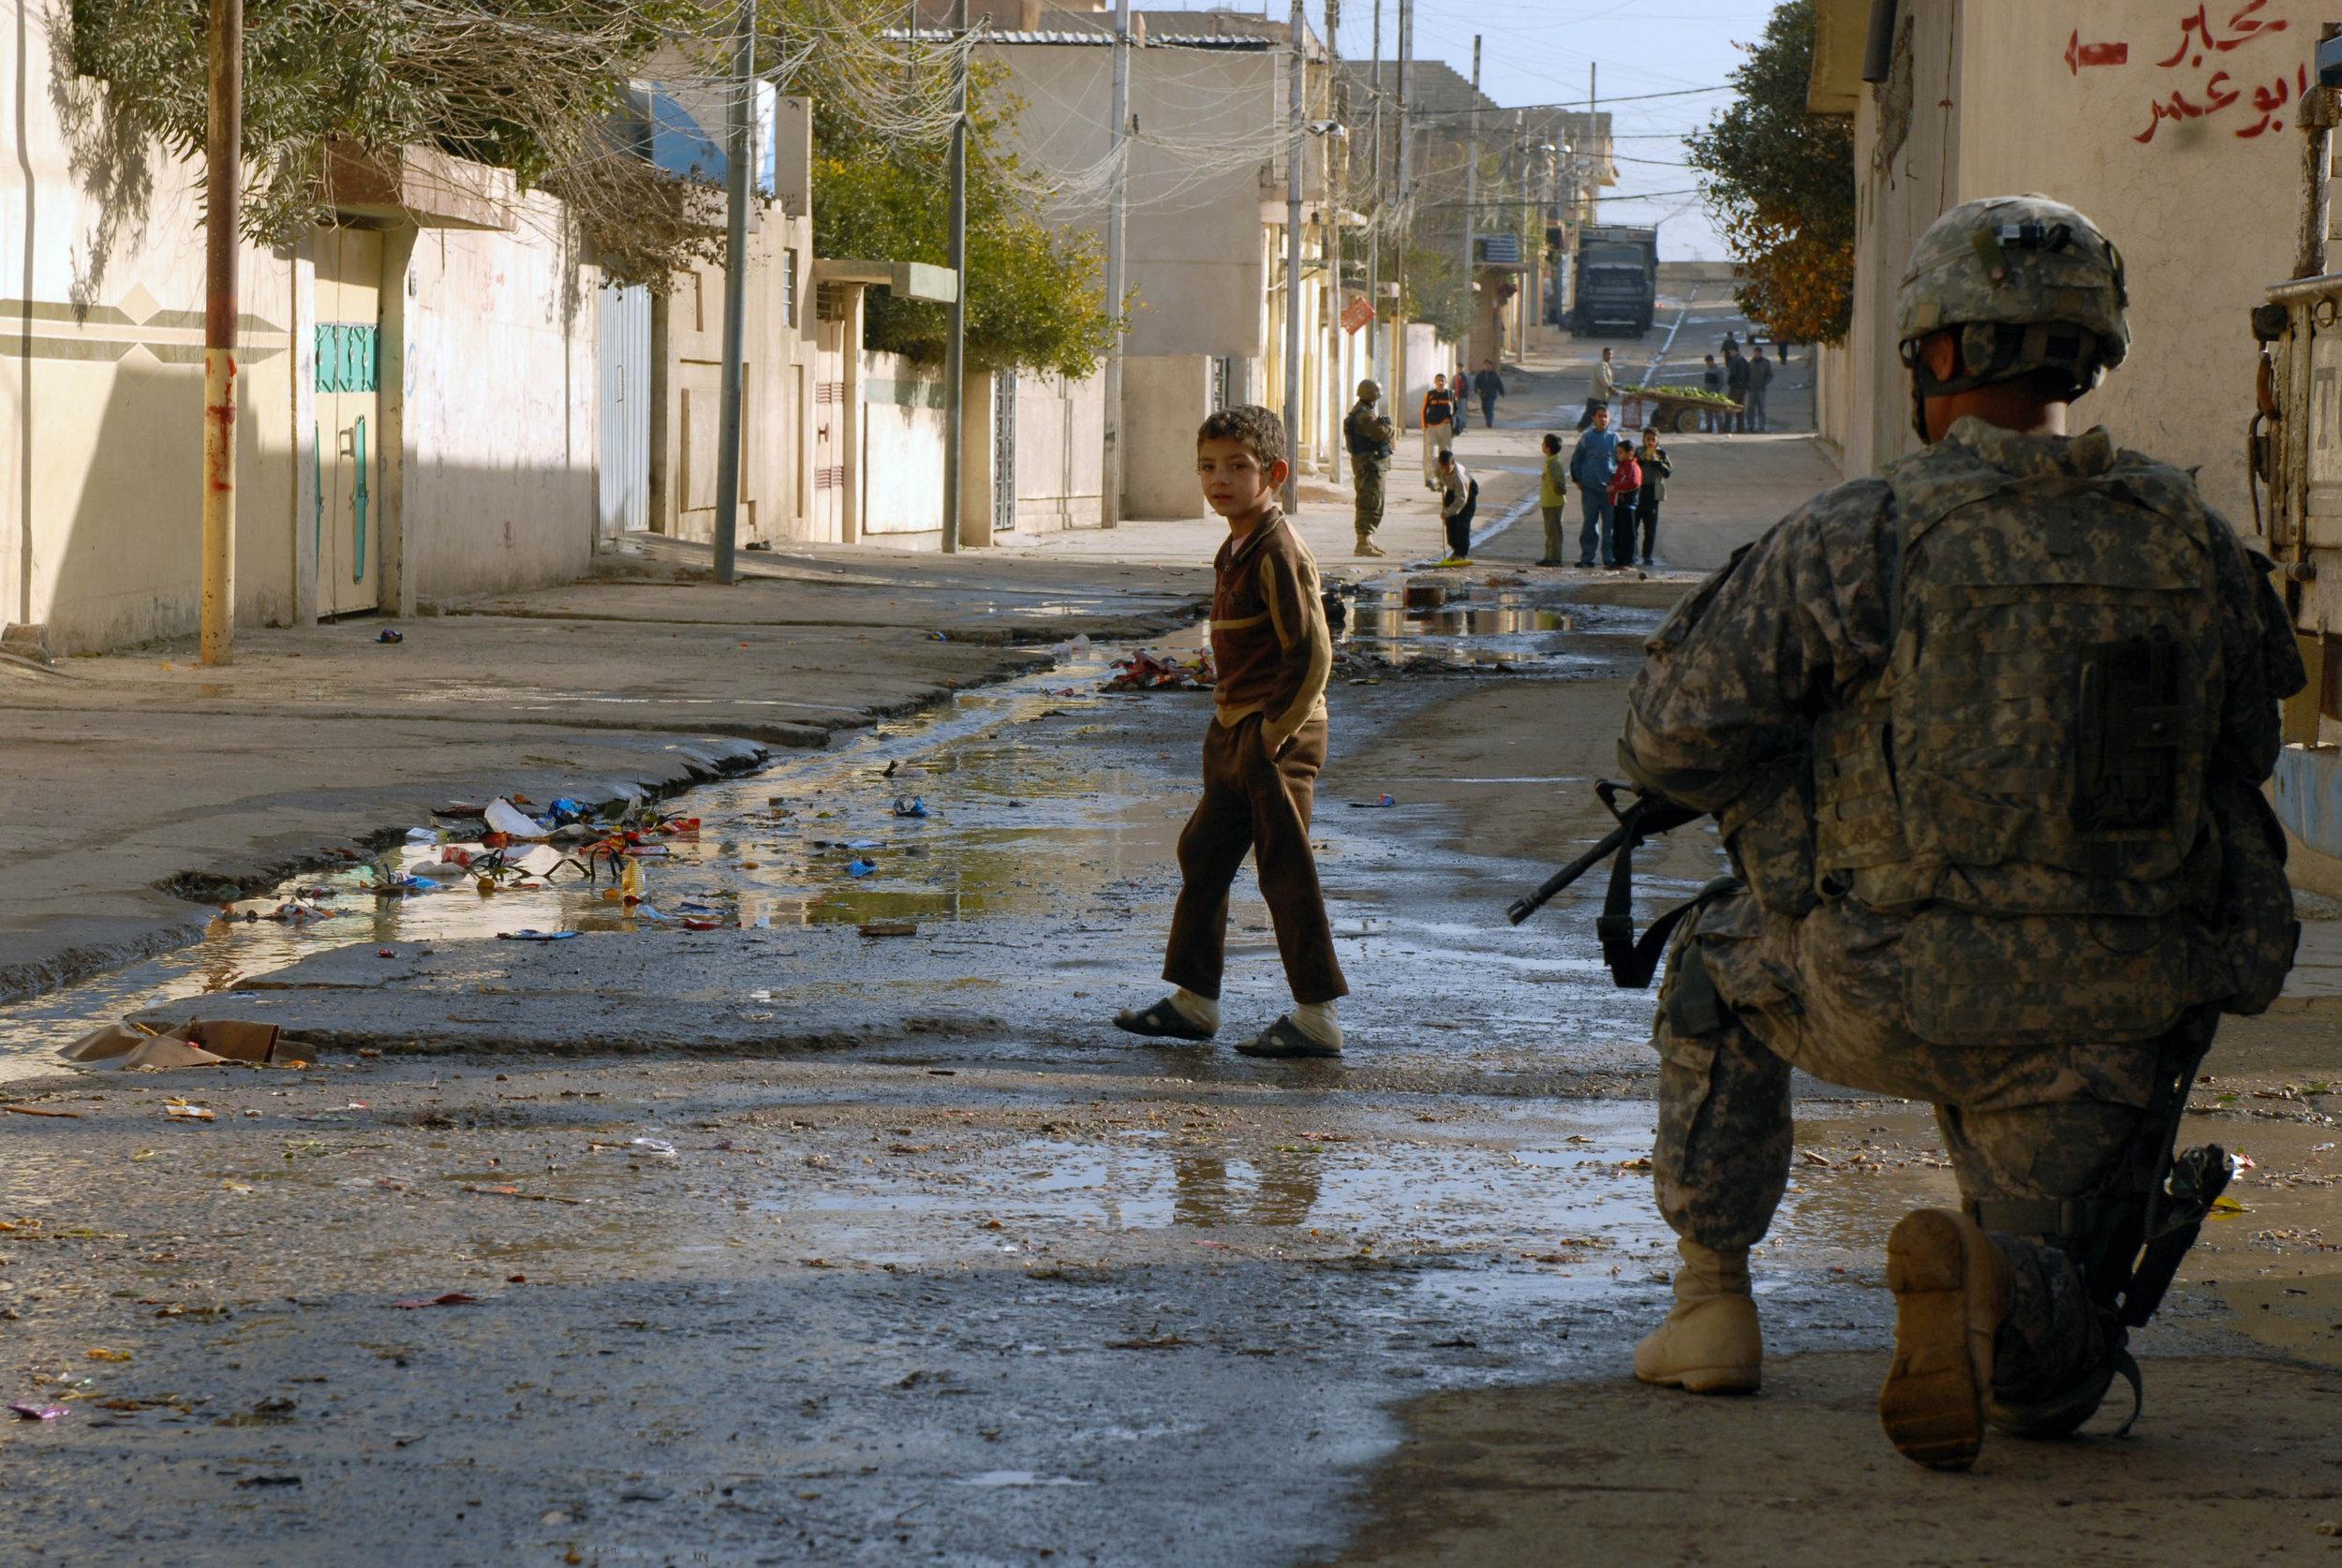 Mosul, Iraq. (The US Army - Flickr)